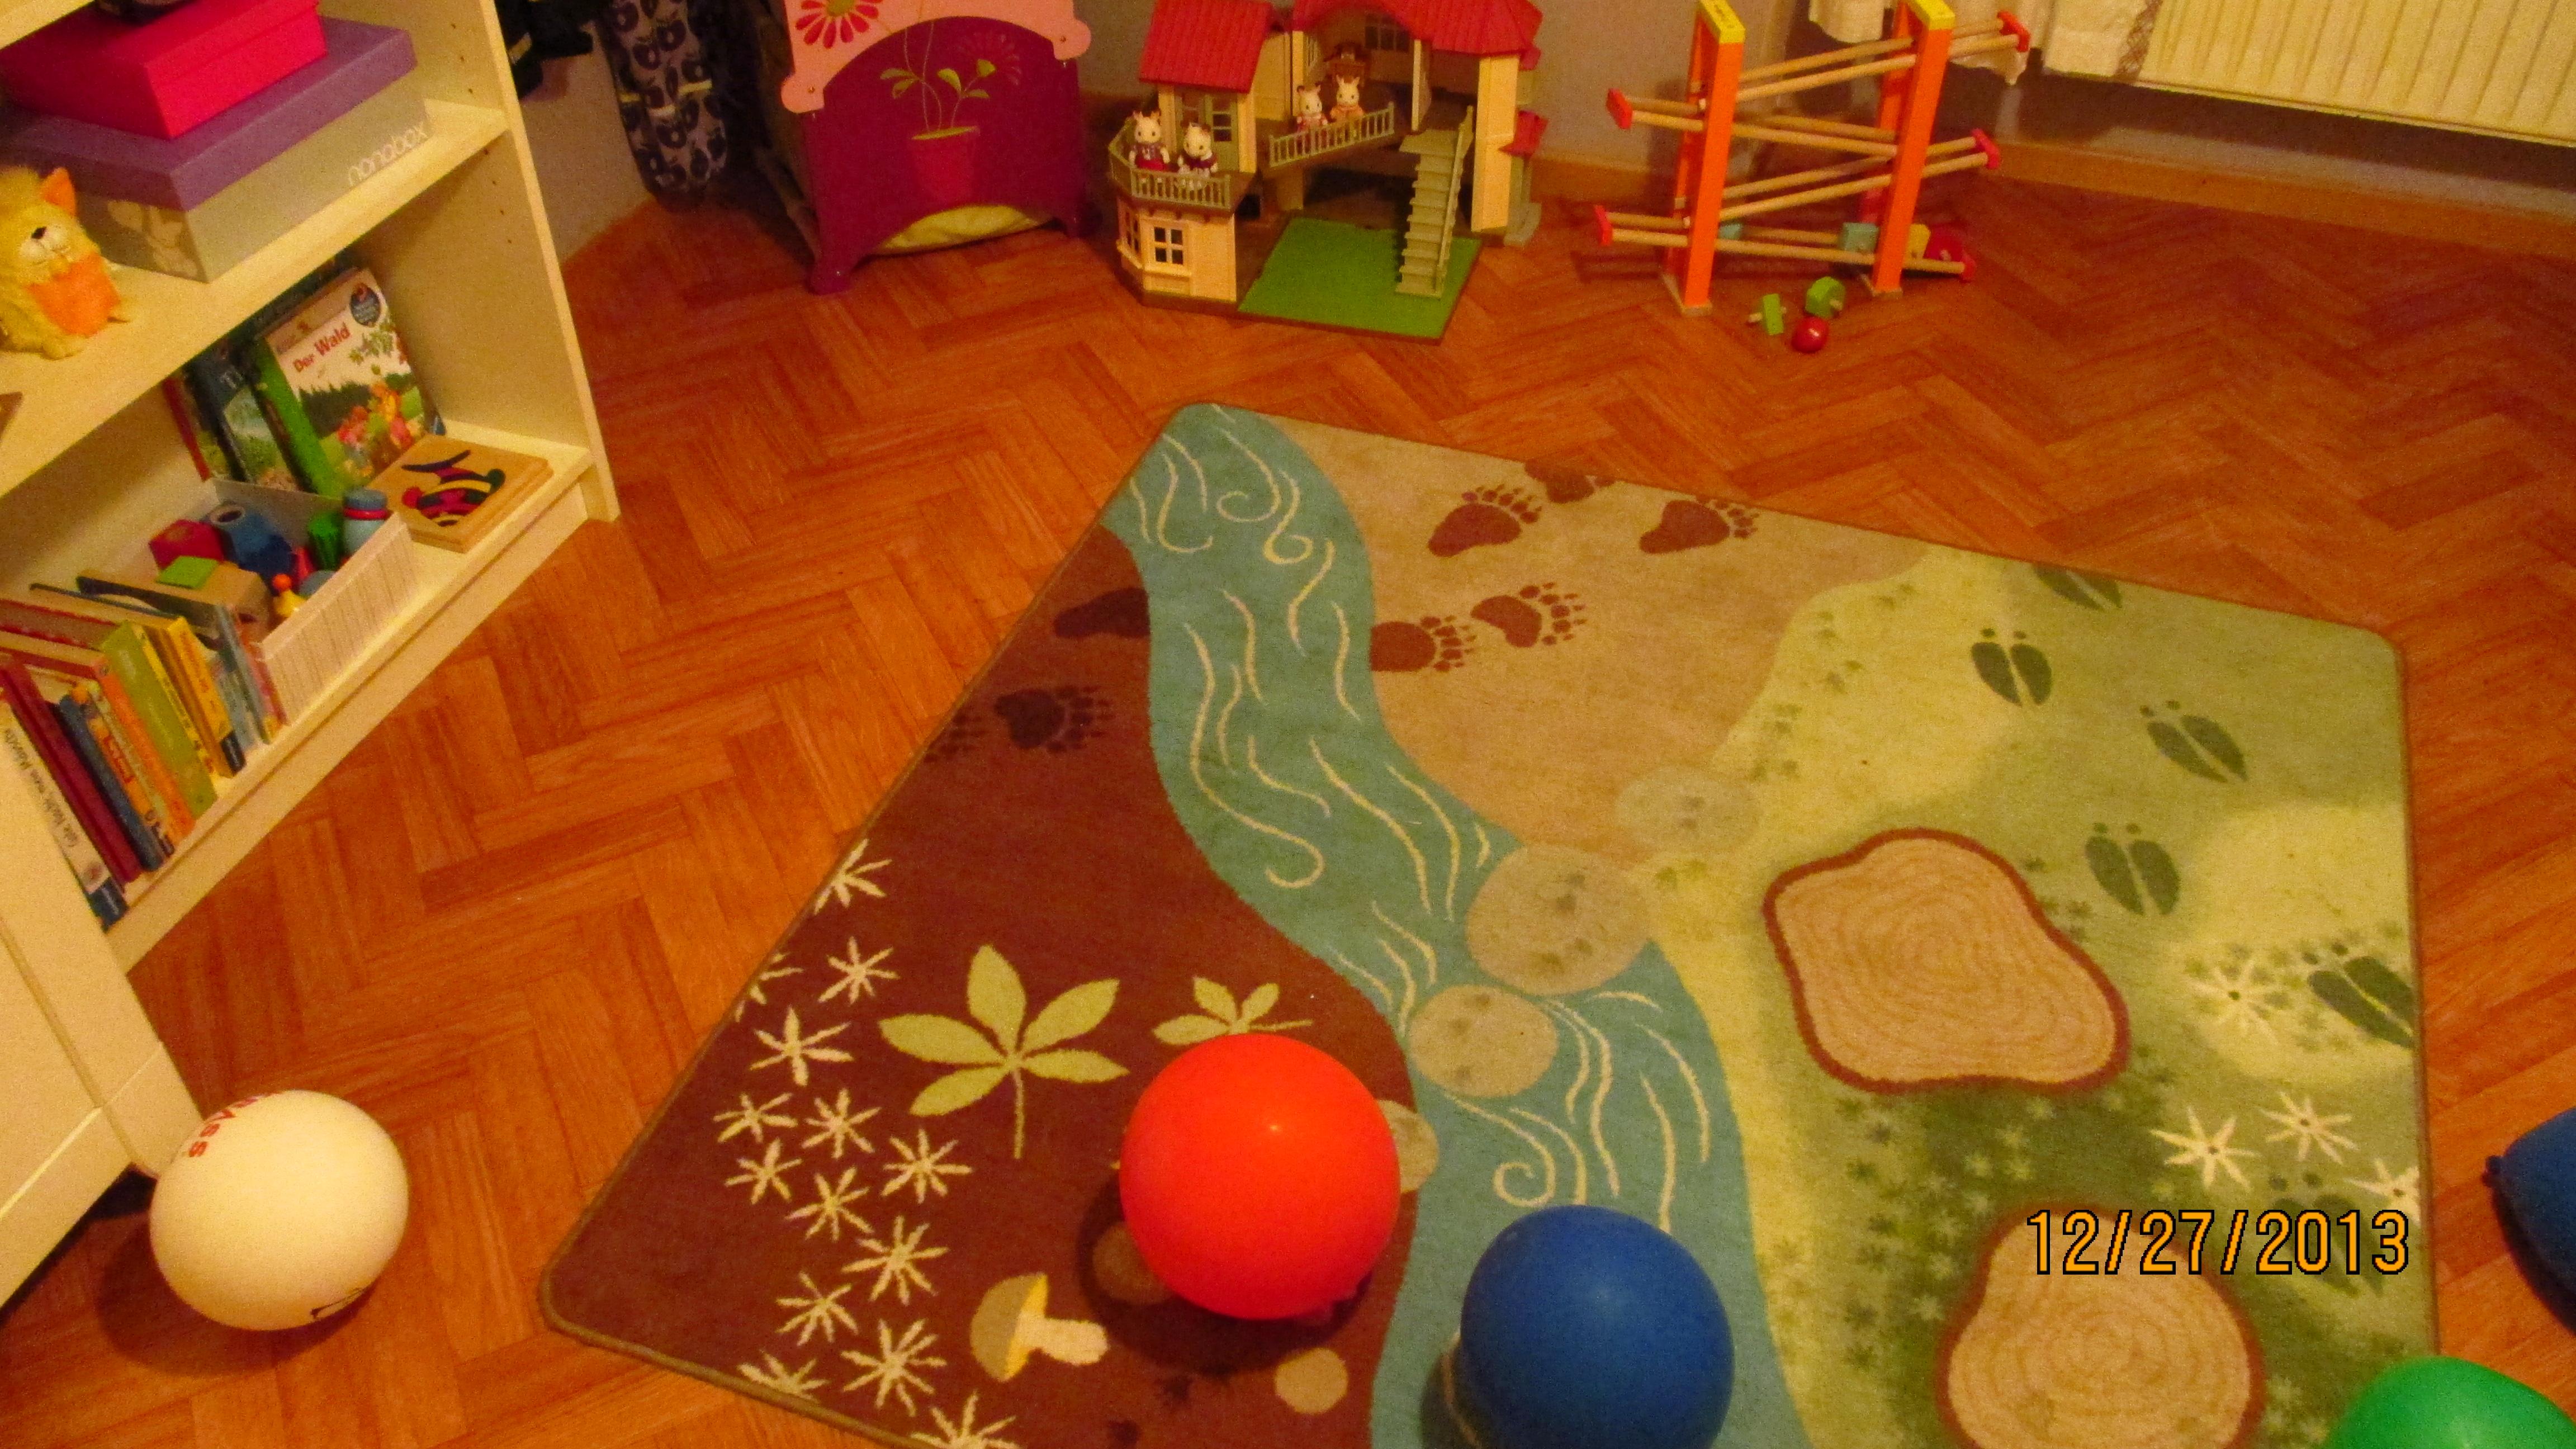 Bettnetz – mamamulle's blog